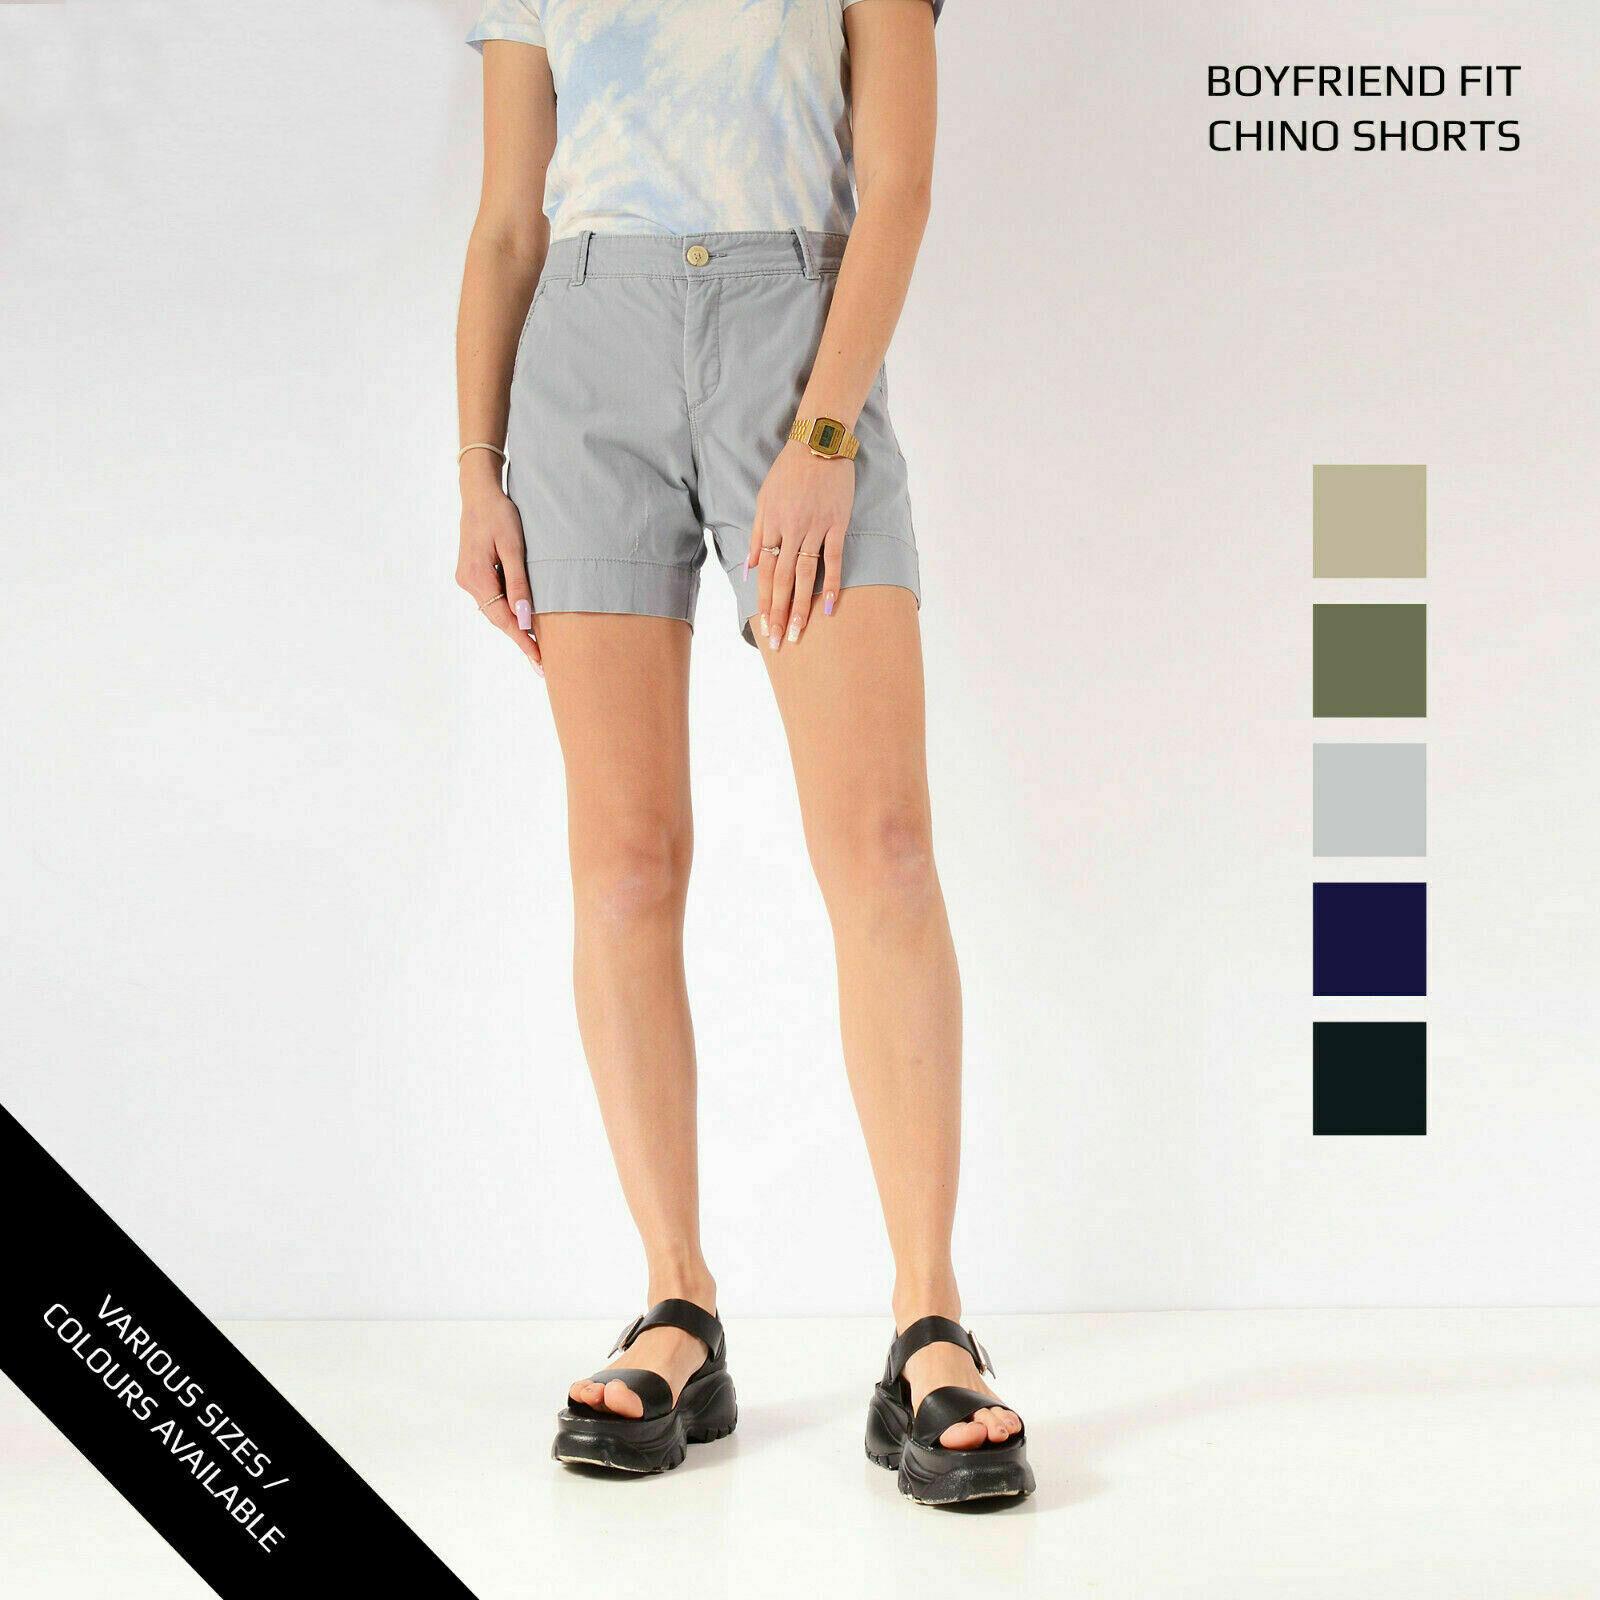 Klasse A DOCKERS Vintage Damen Chino Boyfriend Passform Shorts Größe 6 8 10 12